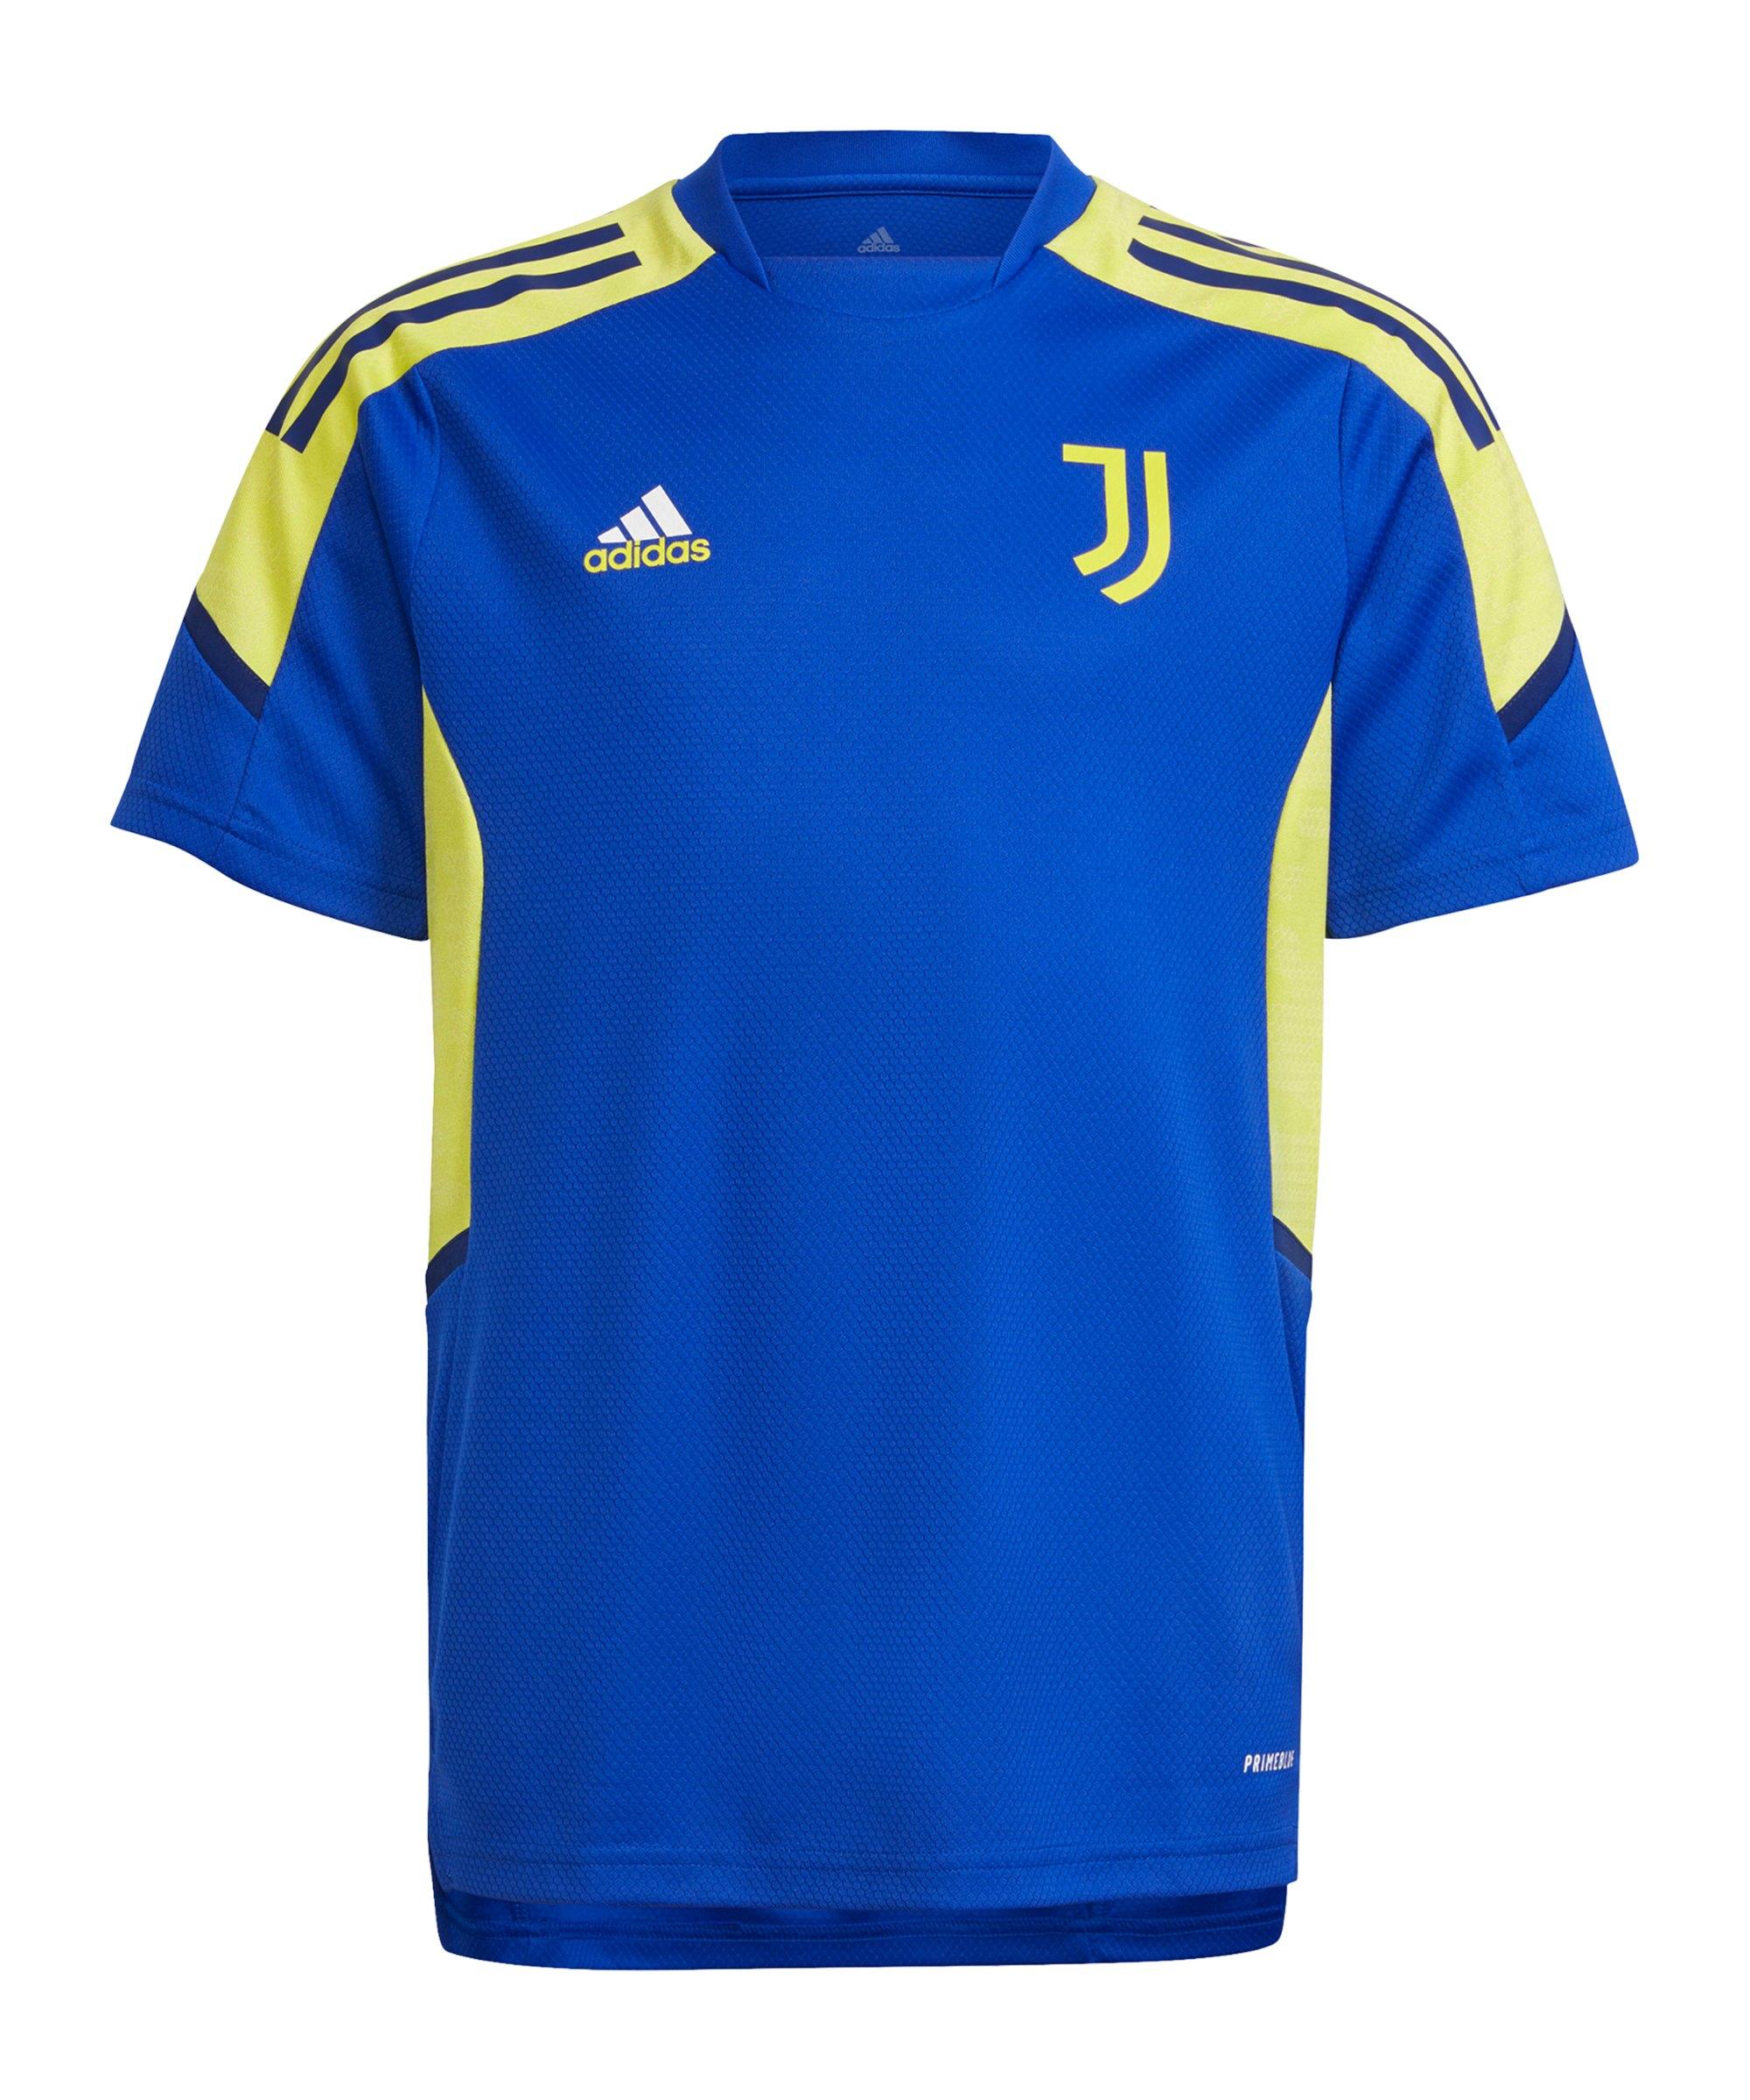 adidas Juventus Turin Trainingsshirt Kids Blau Gelb - blau